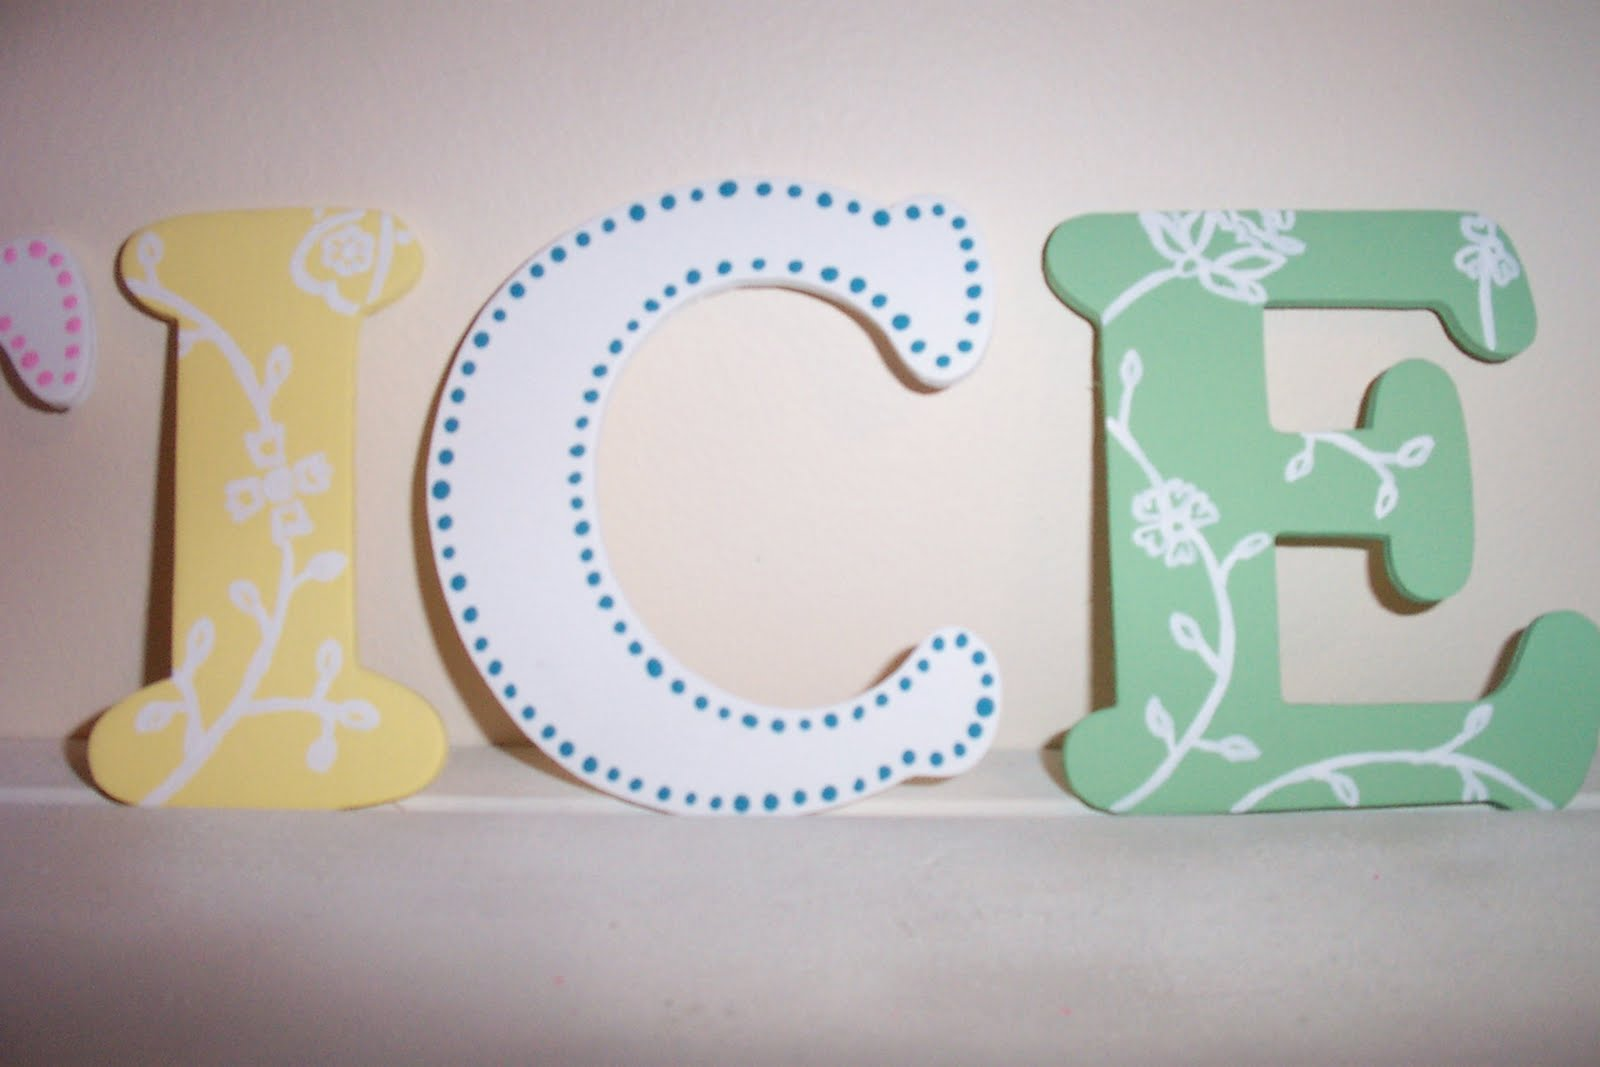 Deliliah Designs Painted Wooden Letters